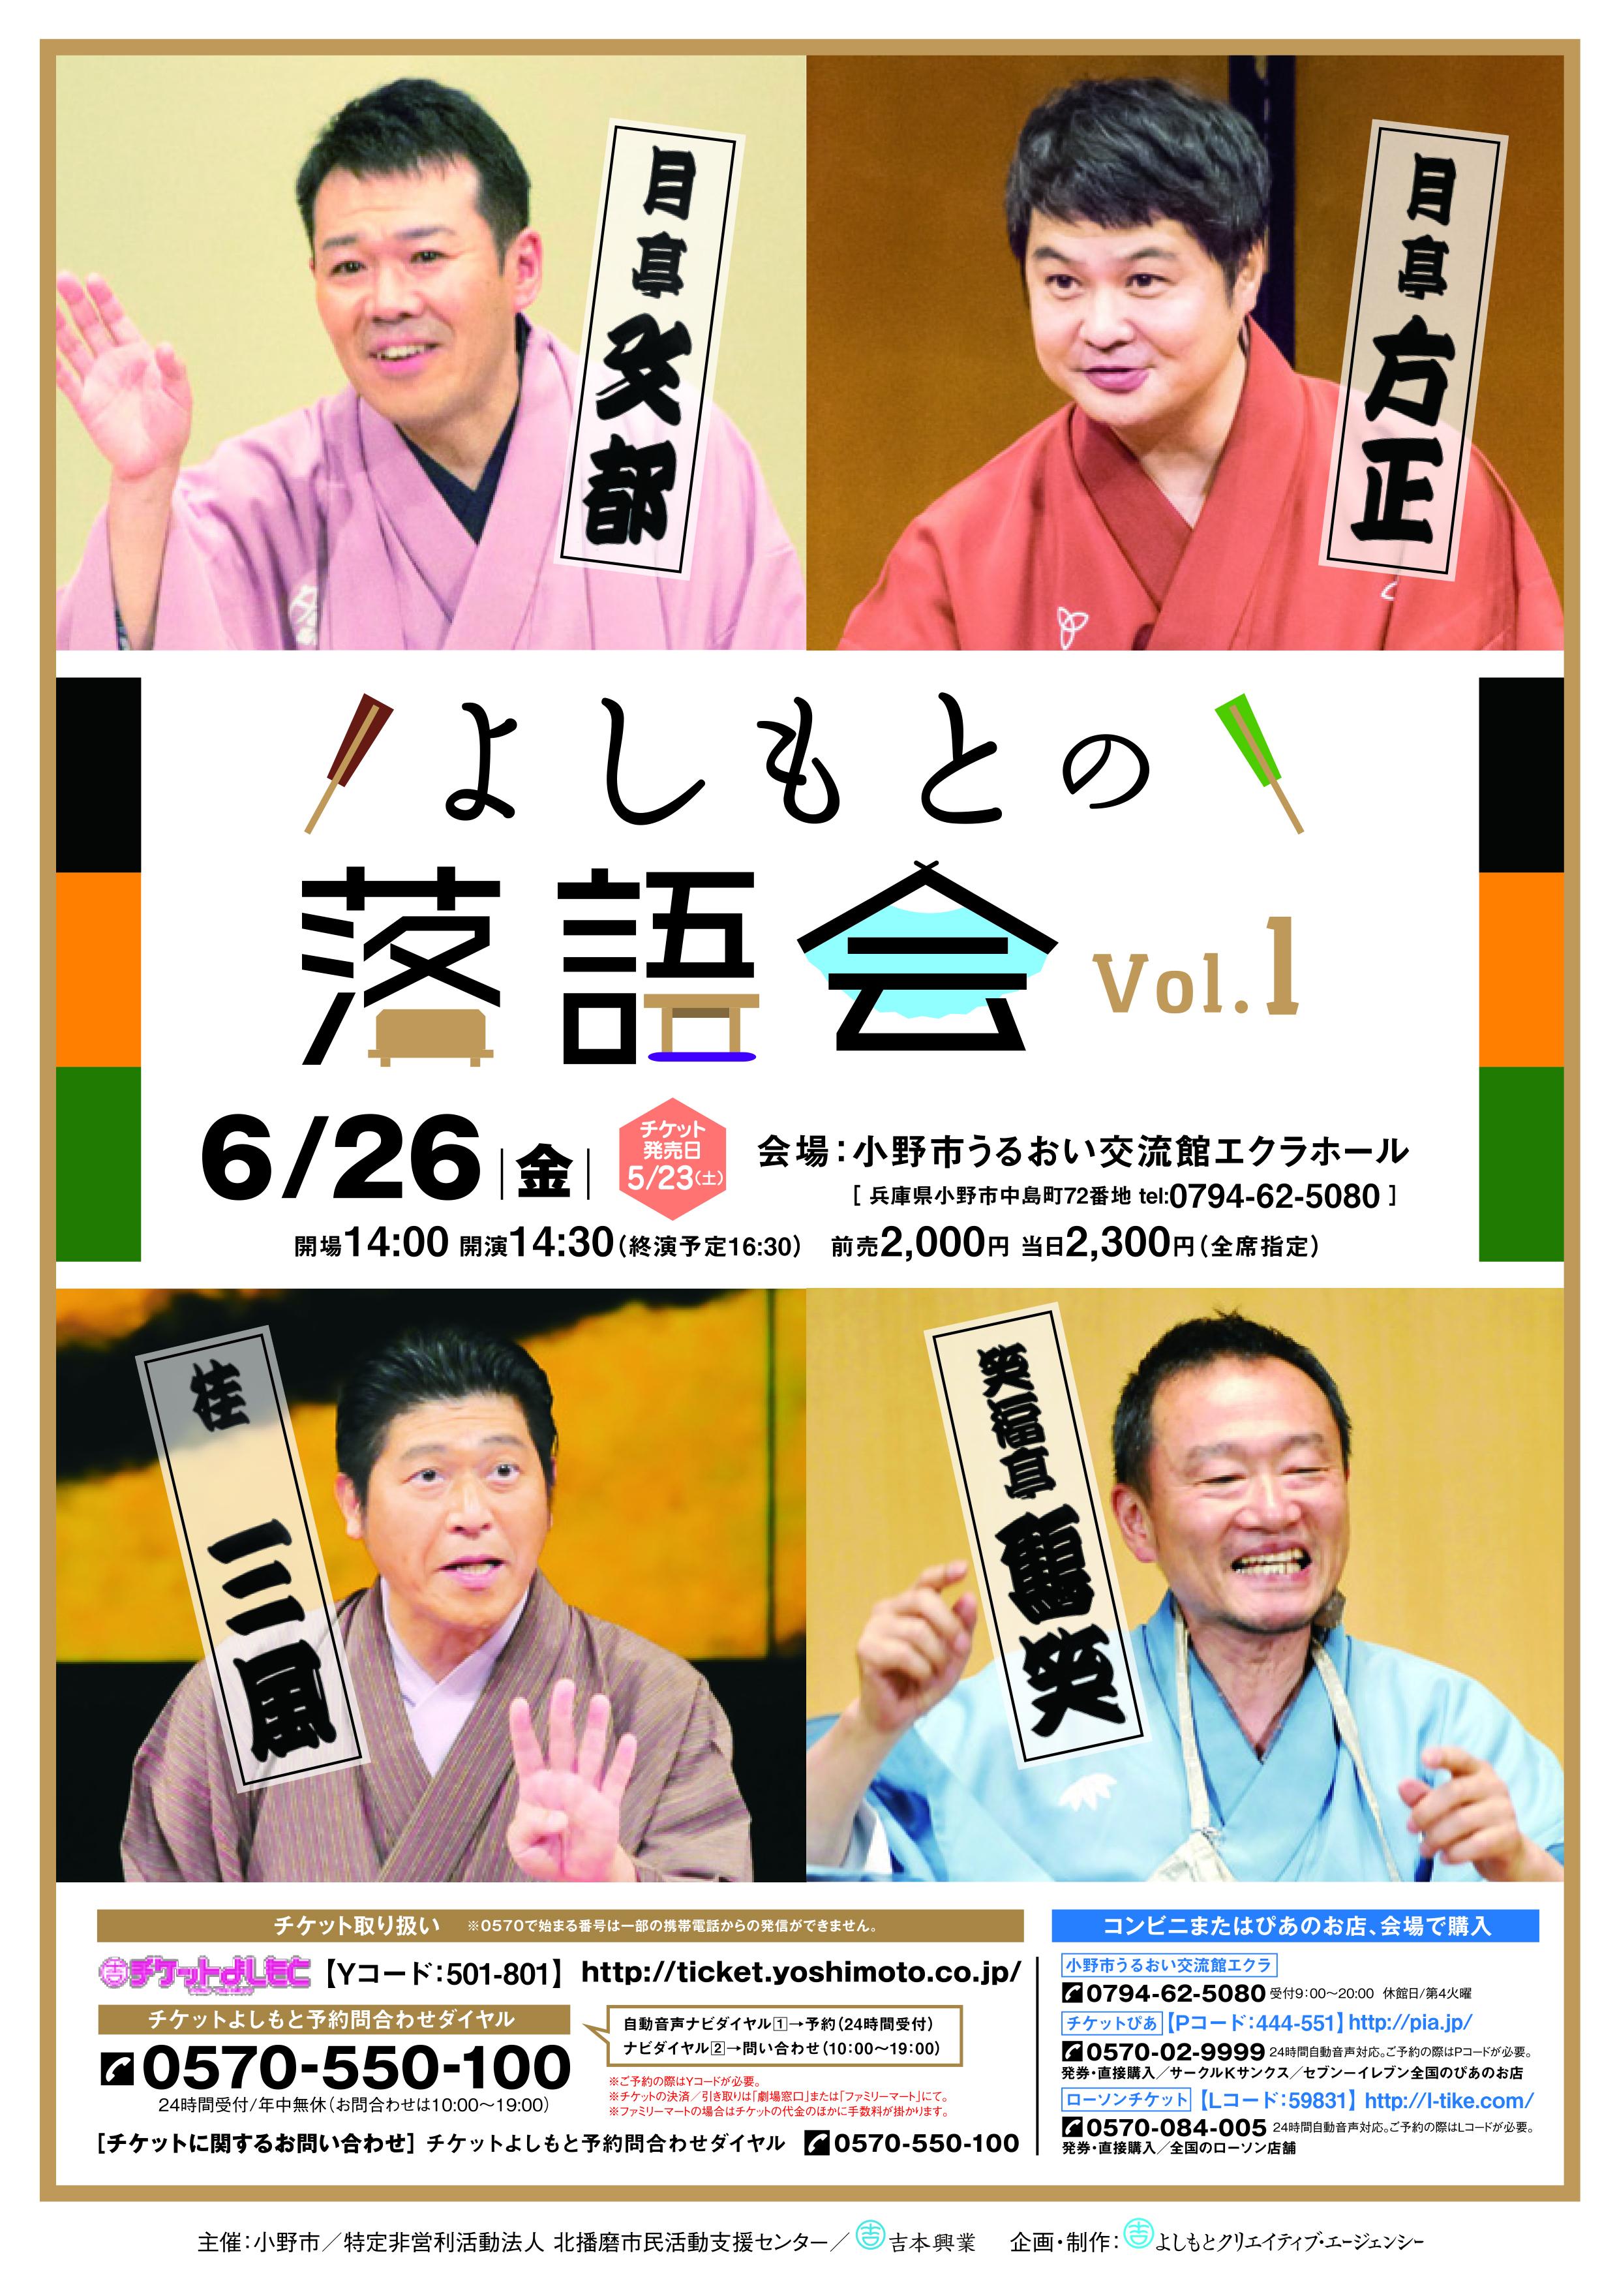 http://www.syumatsu.jp/photos/uncategorized/2015/06/11/20150611191919-368c493c95fc18e9f0825a35d080bf7bc809b0cd.jpg